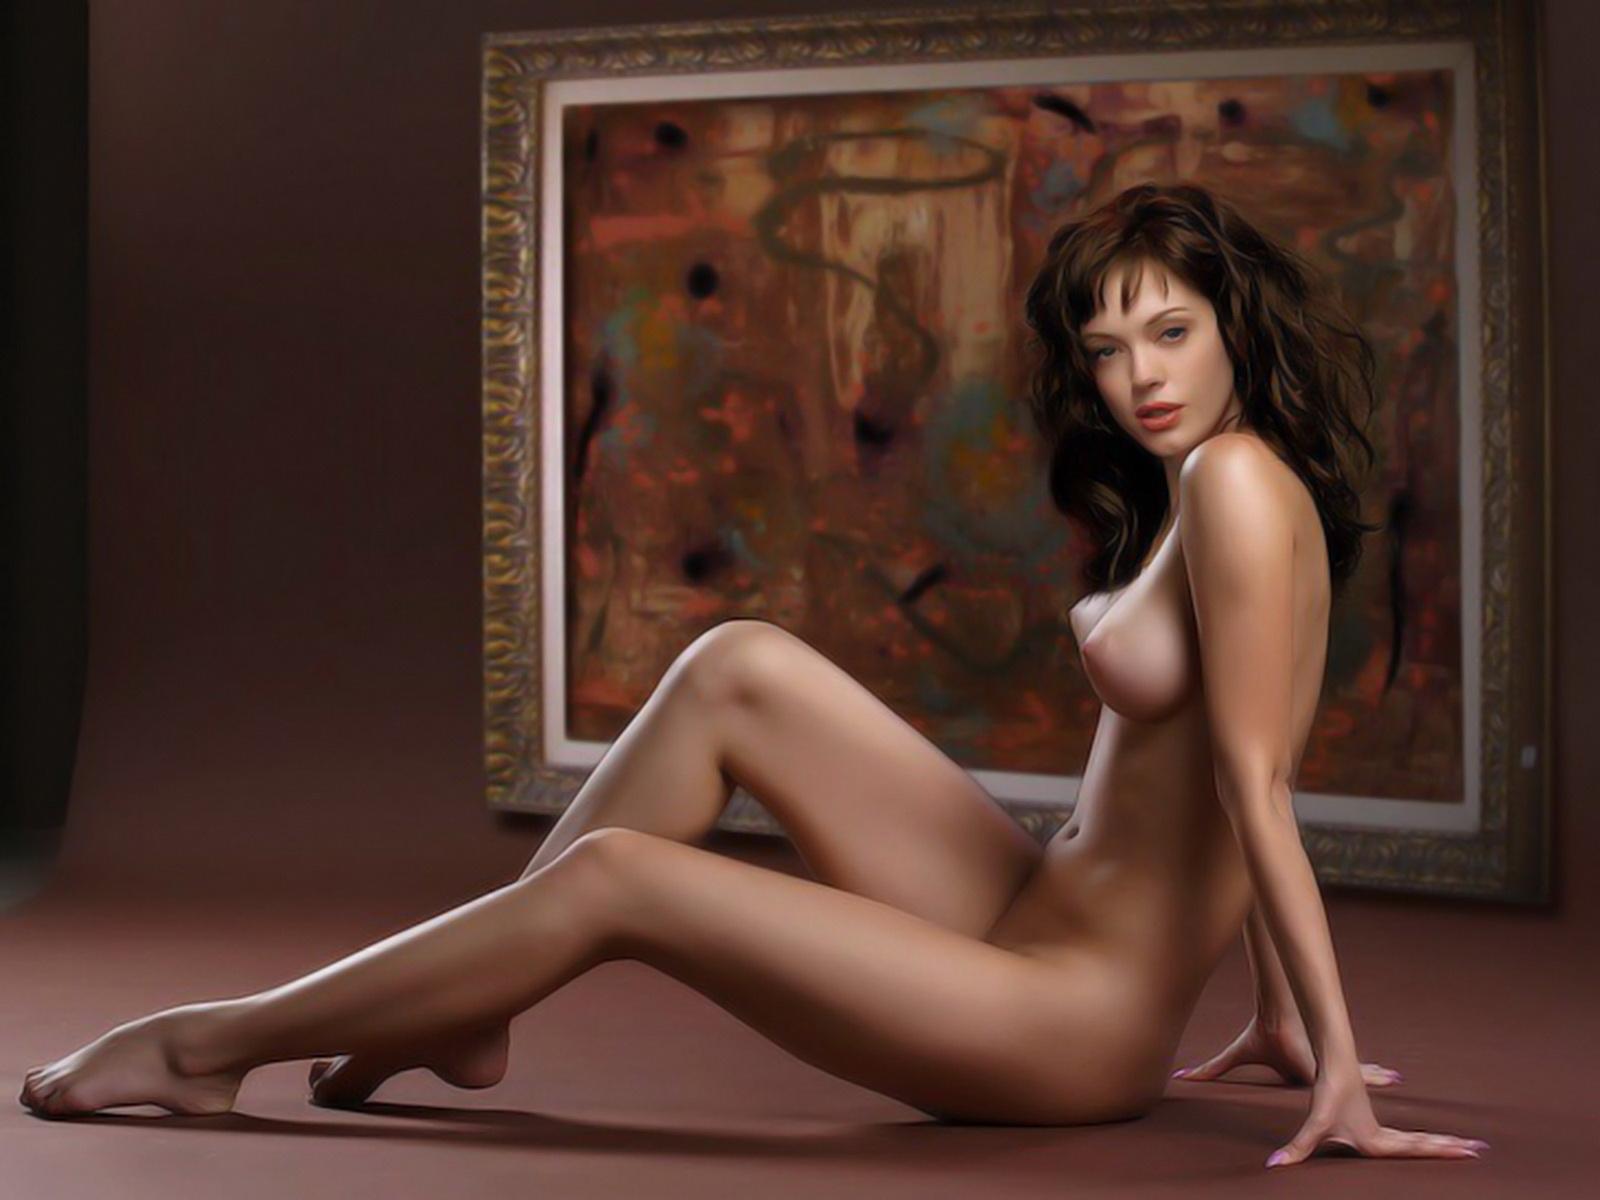 Nudist camp fl